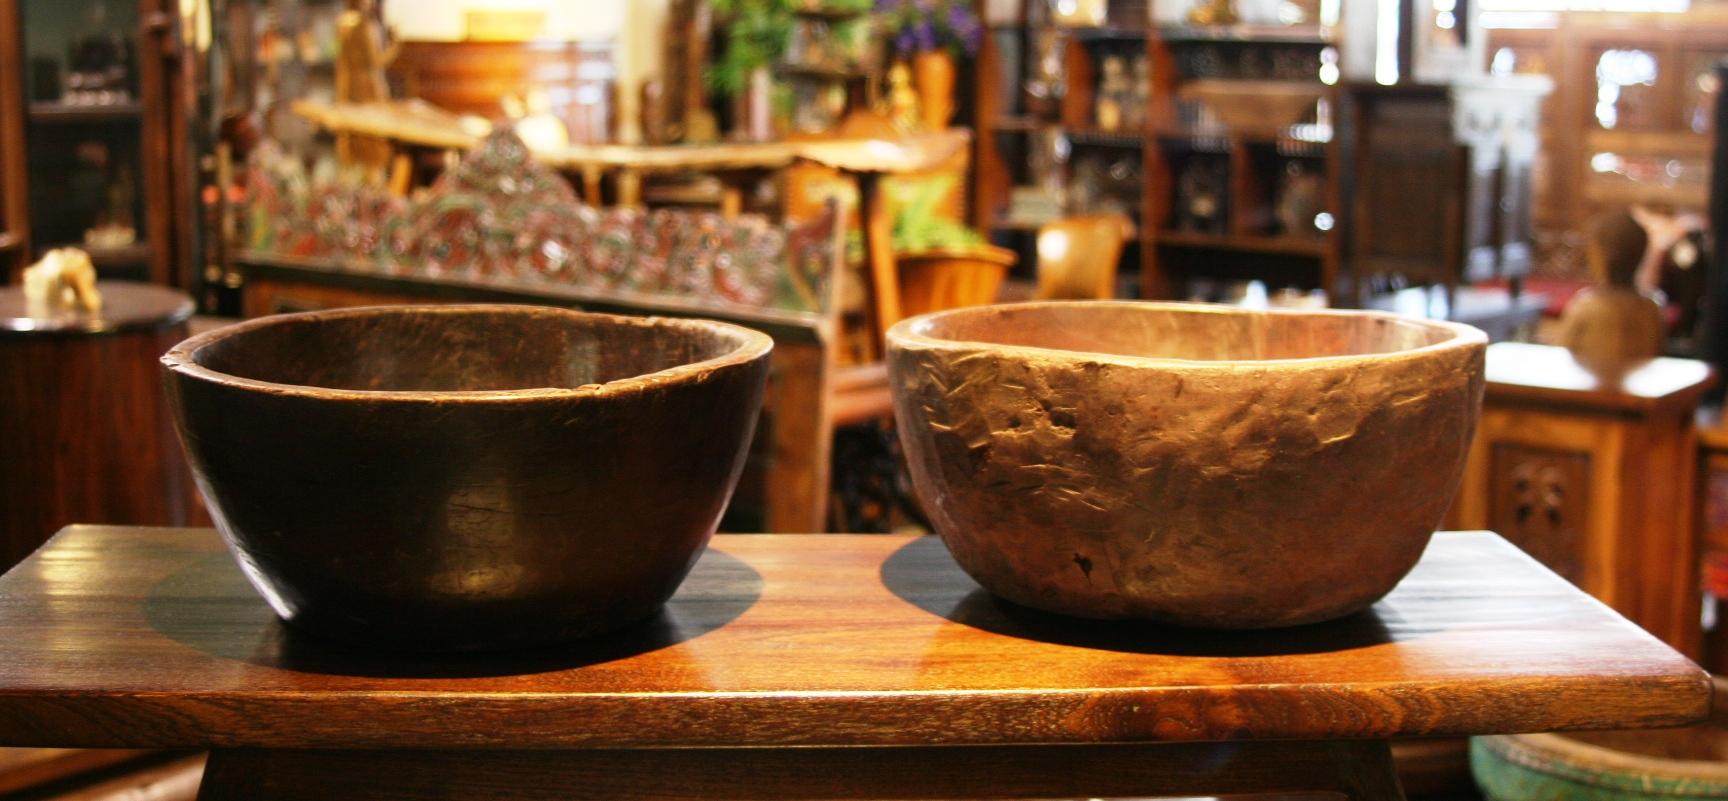 Old Rustic Bowl 3